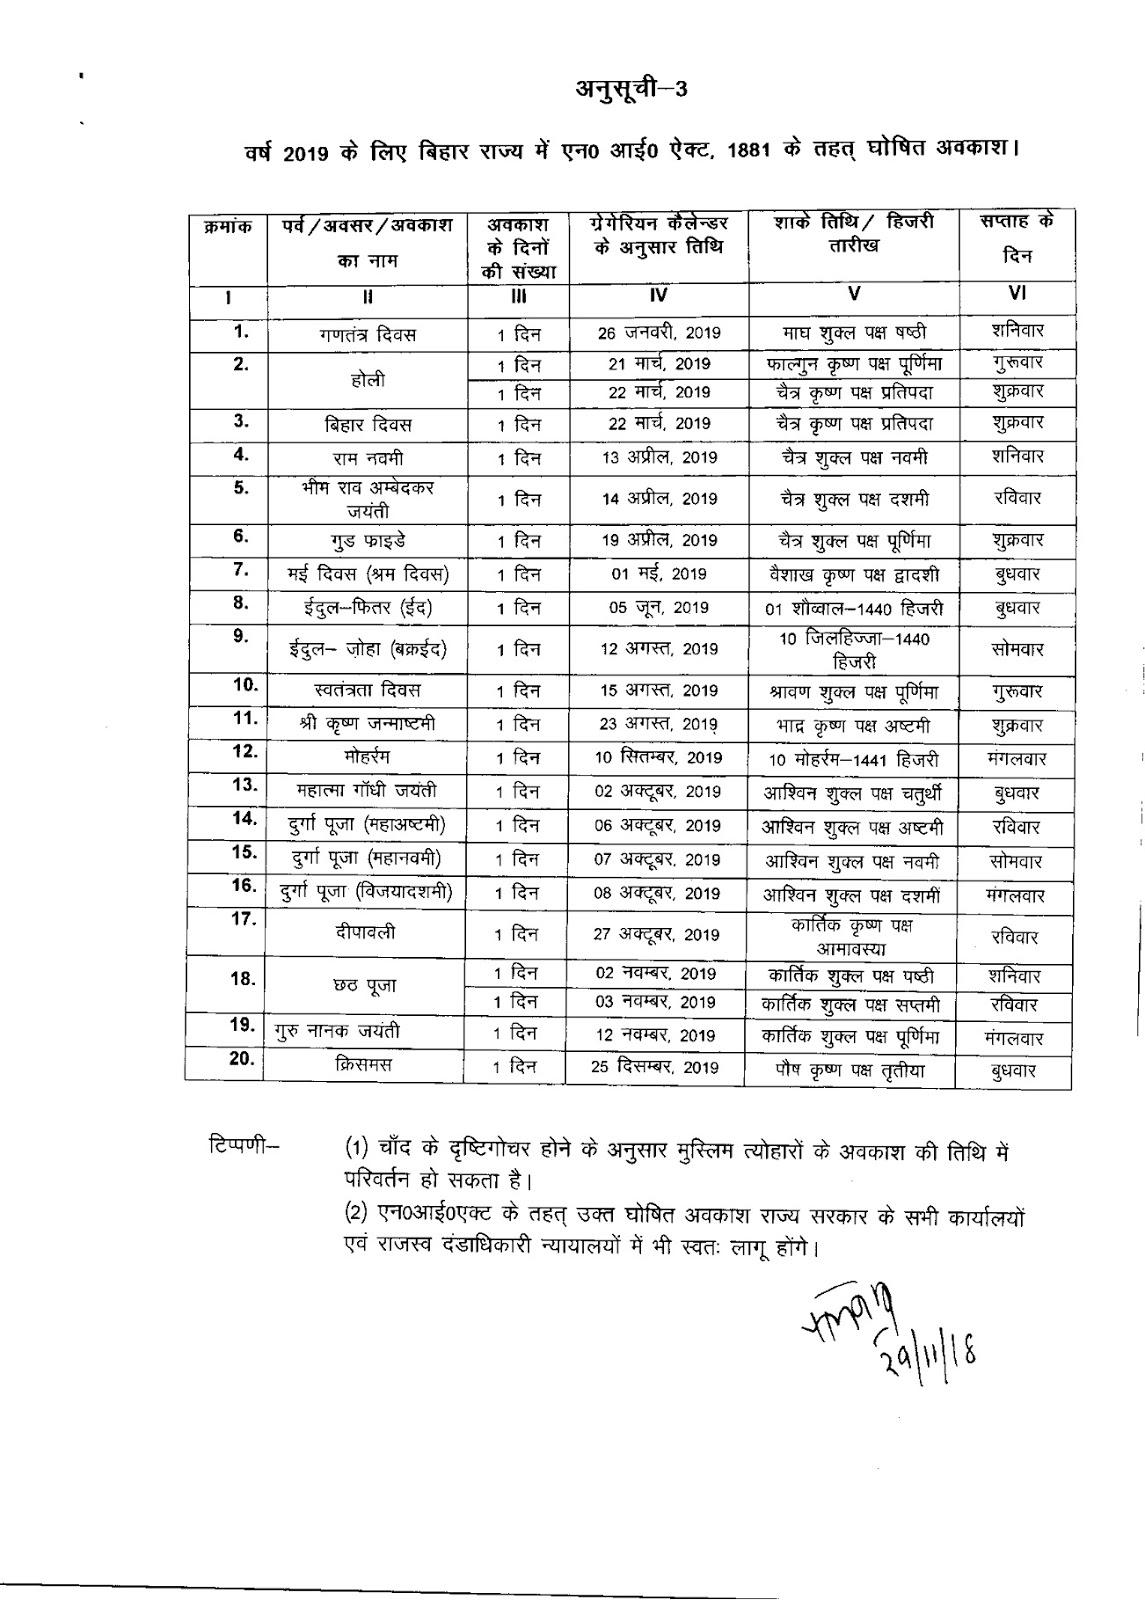 Bihar Government Calendar 2019 #educratsweb with regard to Download Bihar Sarkar Calendar 2020